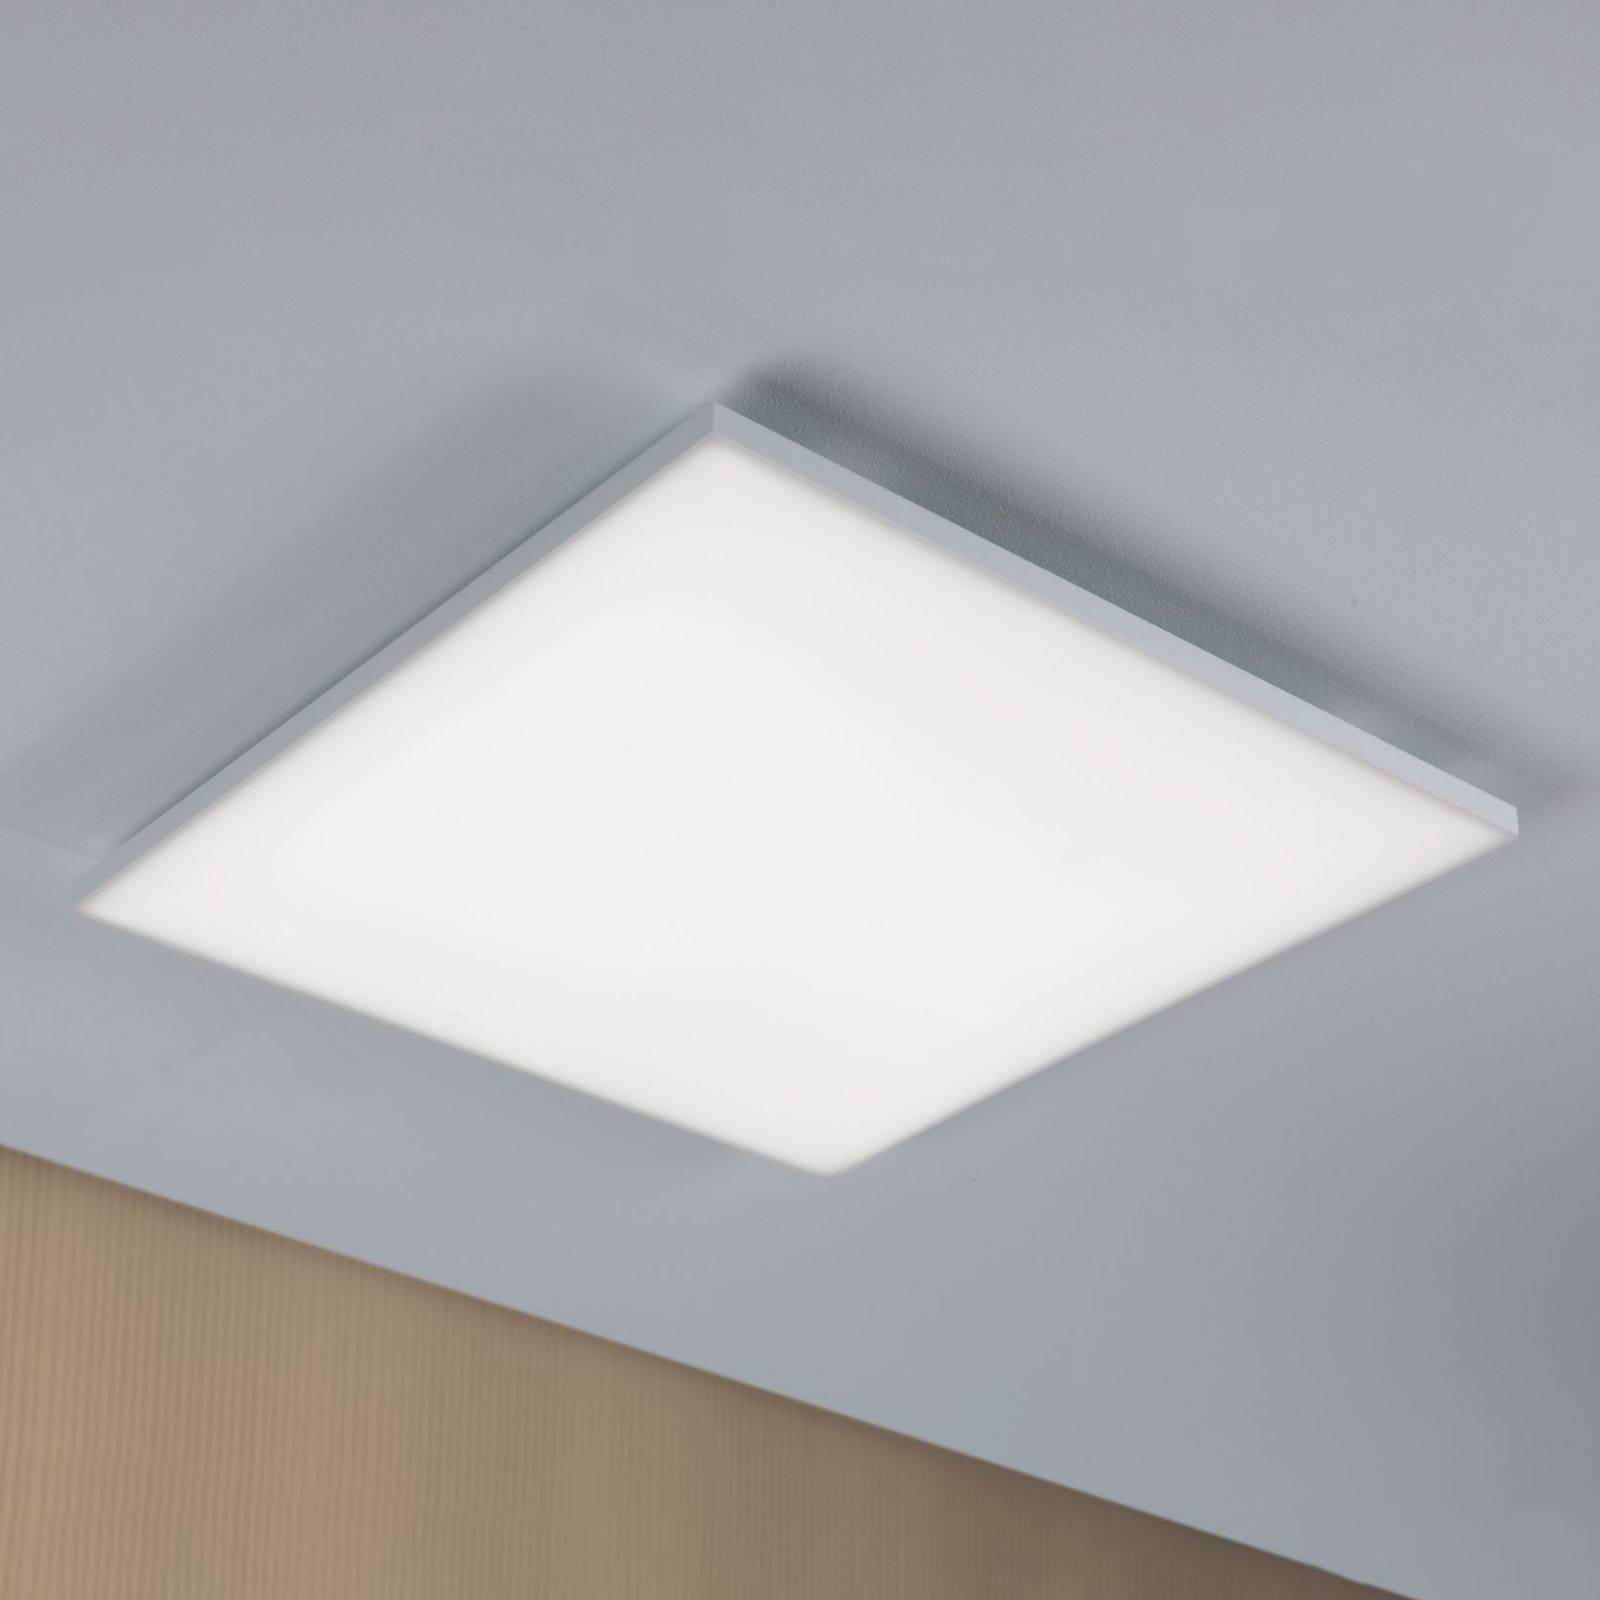 Paulmann Velora -LED-kattovalaisin 59,5 x 59,5 cm